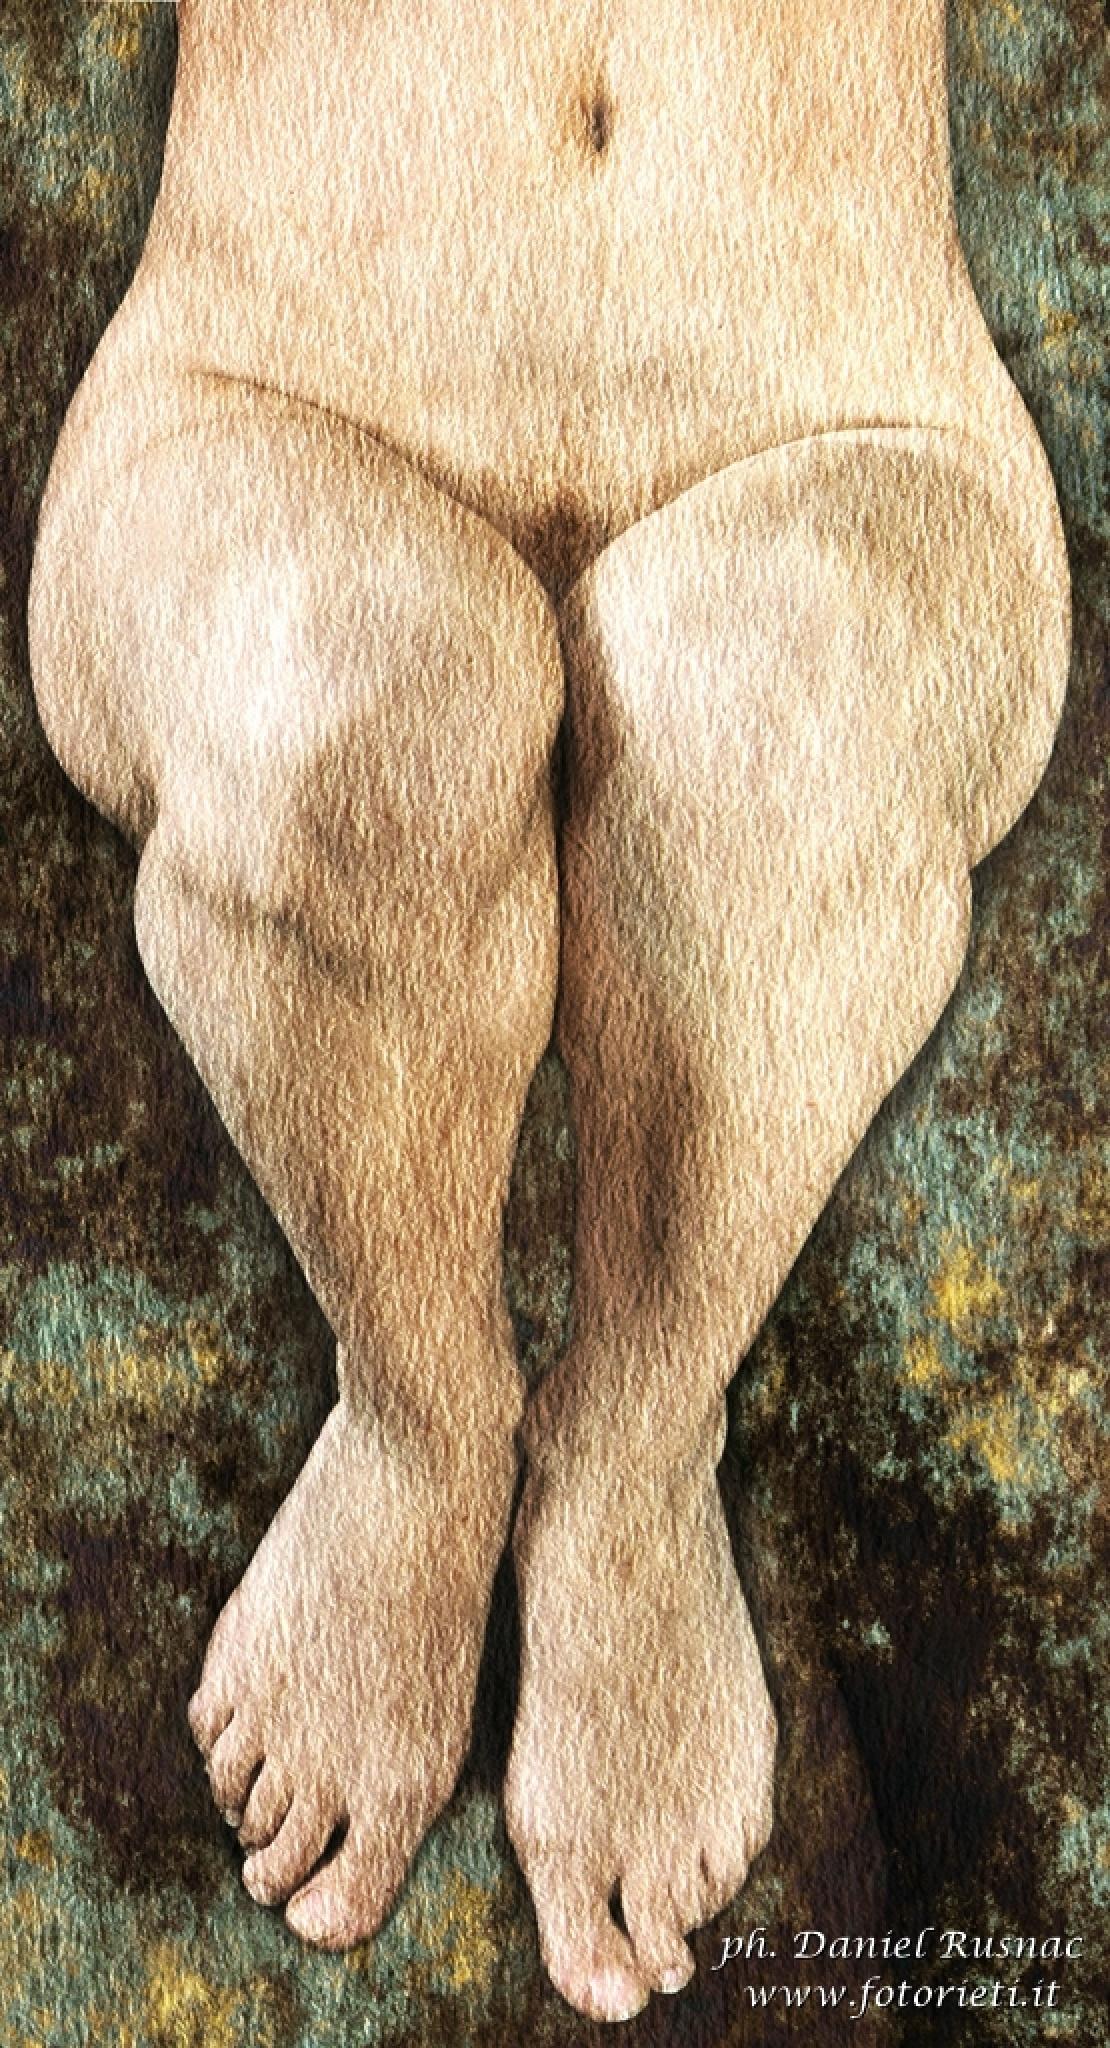 Body part by Daniel Rusnac di Fotorieti